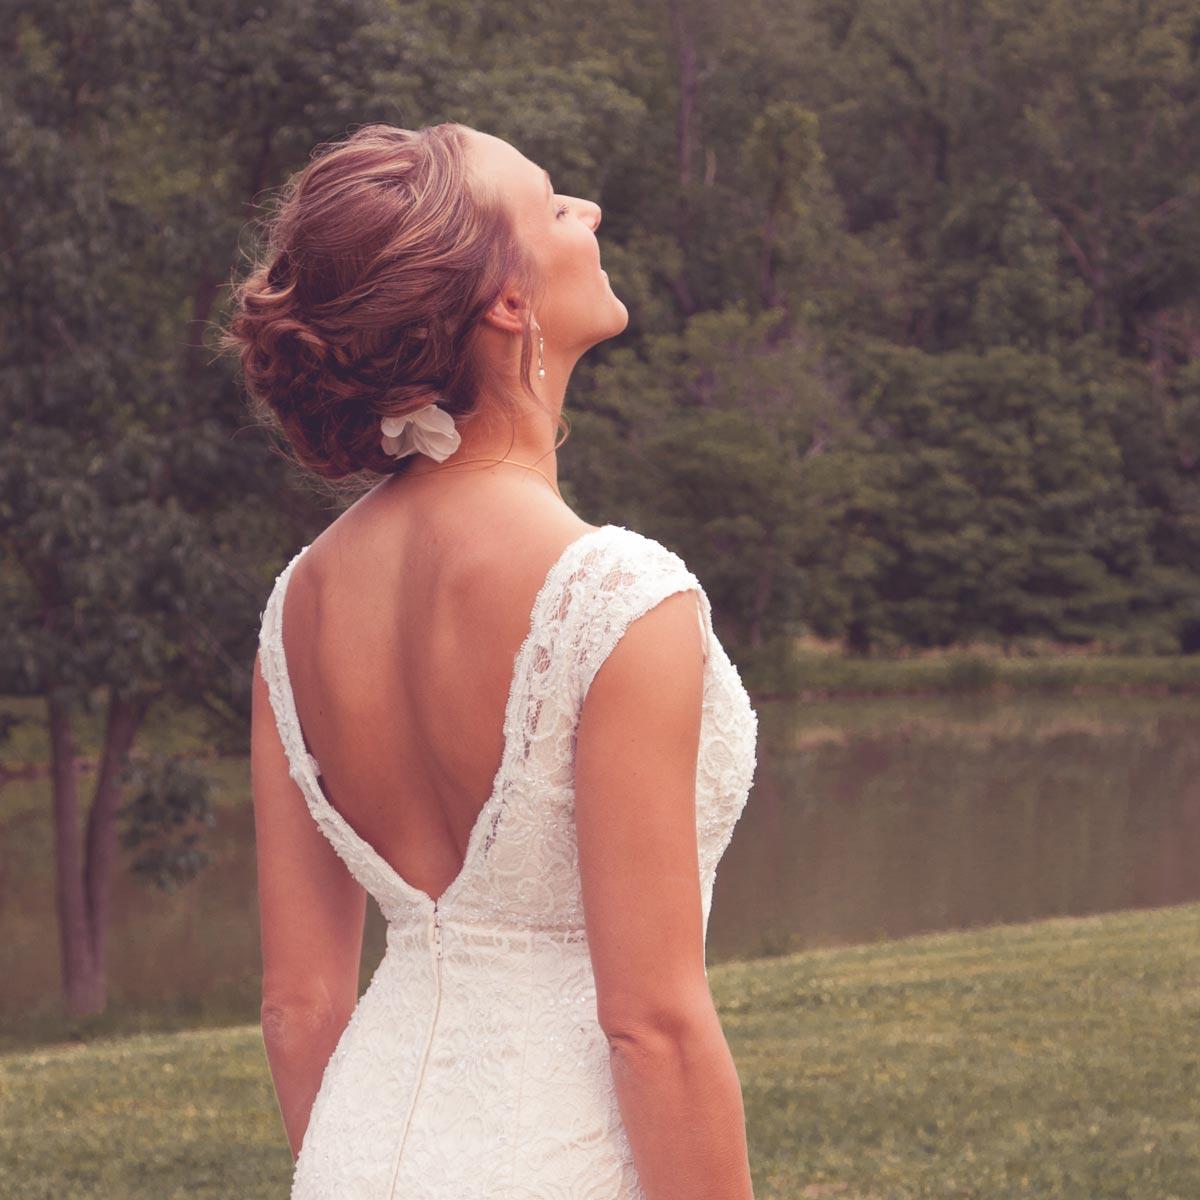 evansville-wedding-photographer-pabst-photo-kokies-echo-valley-(49)